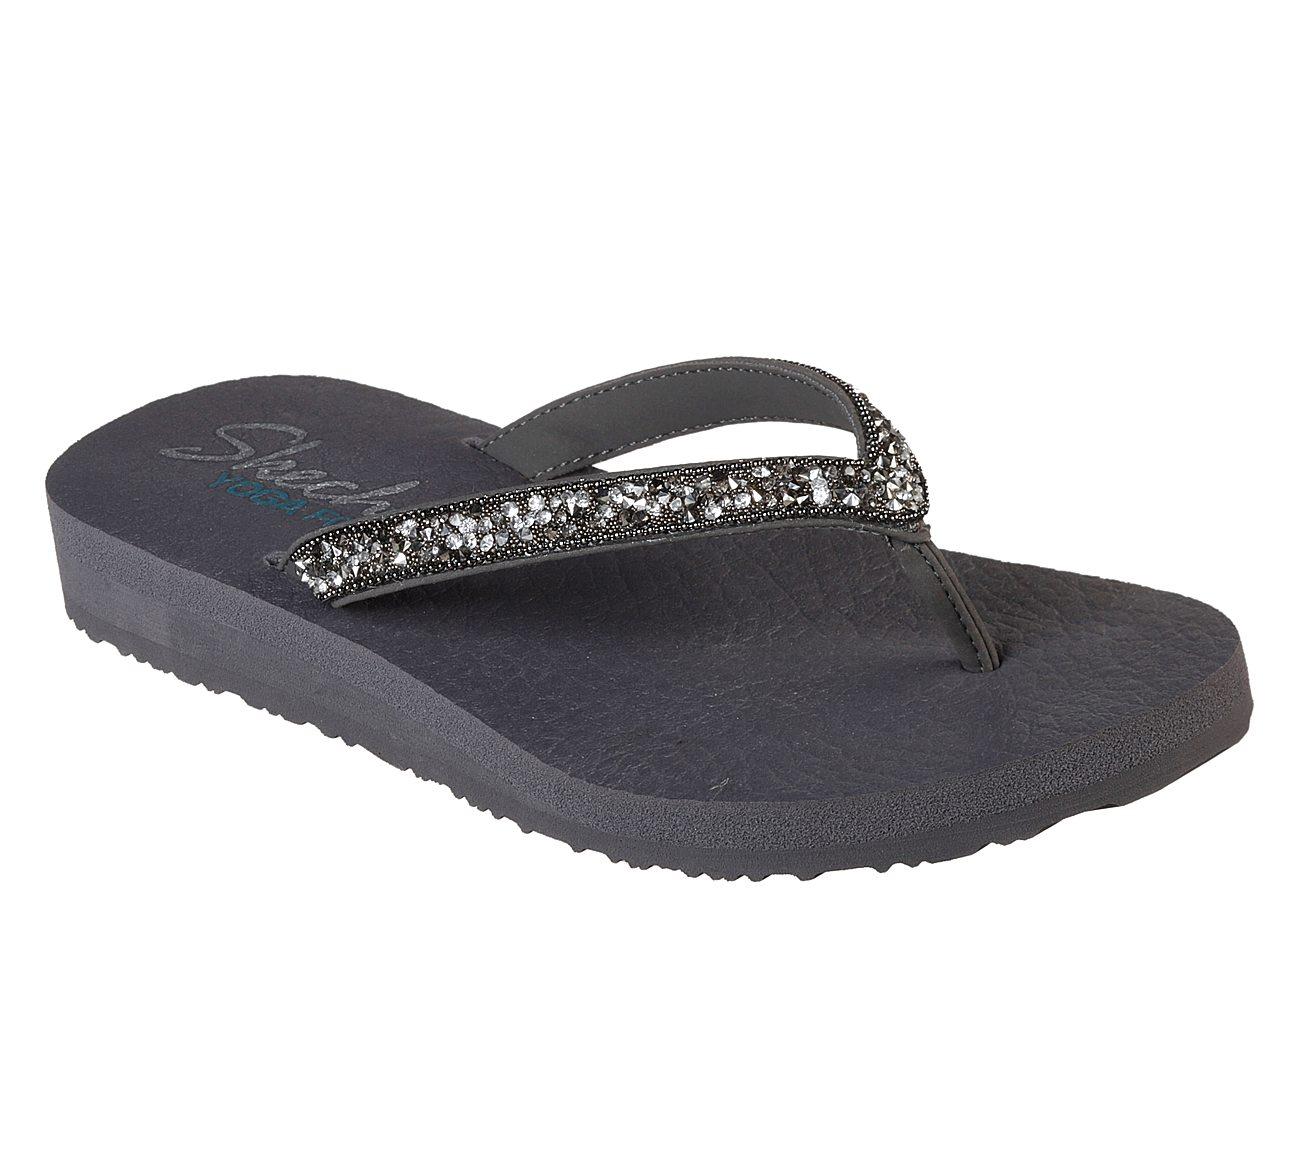 74545a5f1677e1 skechers slippers silver Sale